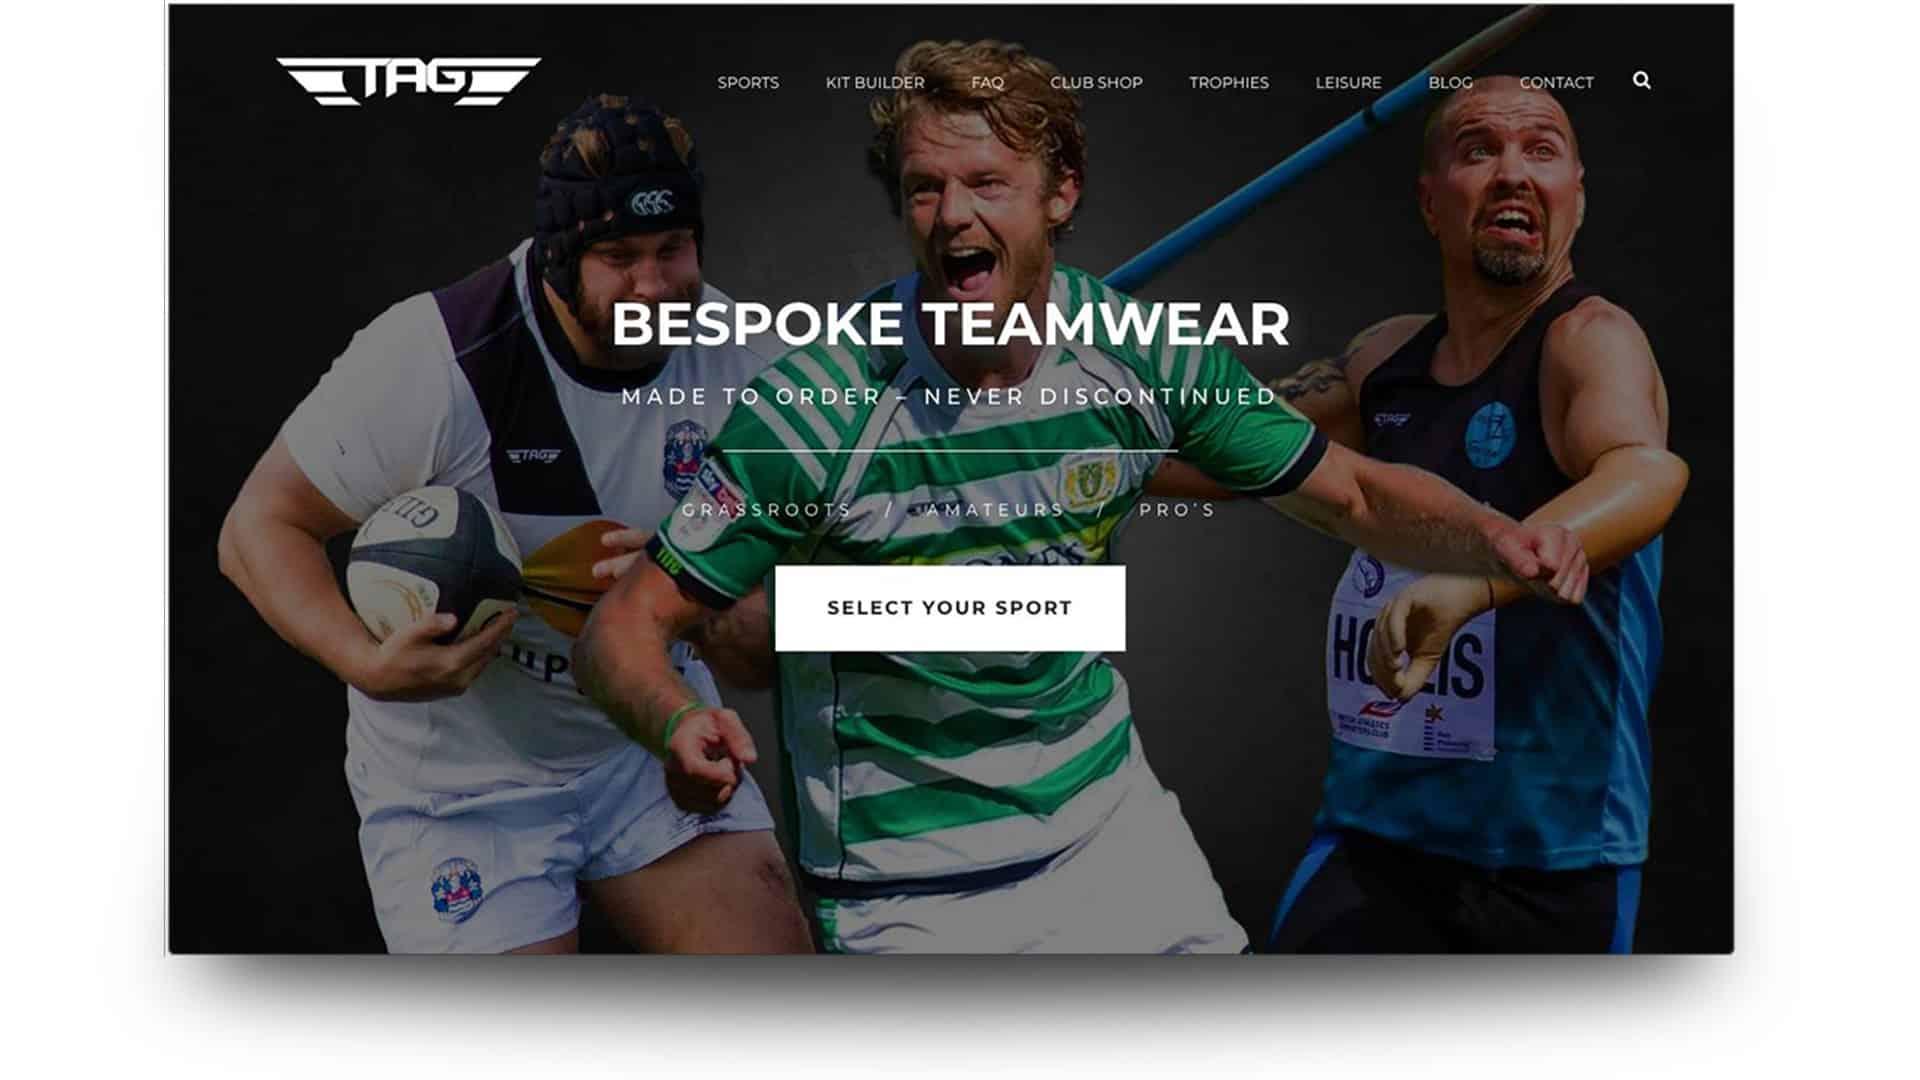 Tag sportswear - wordpress website design portolio - 11